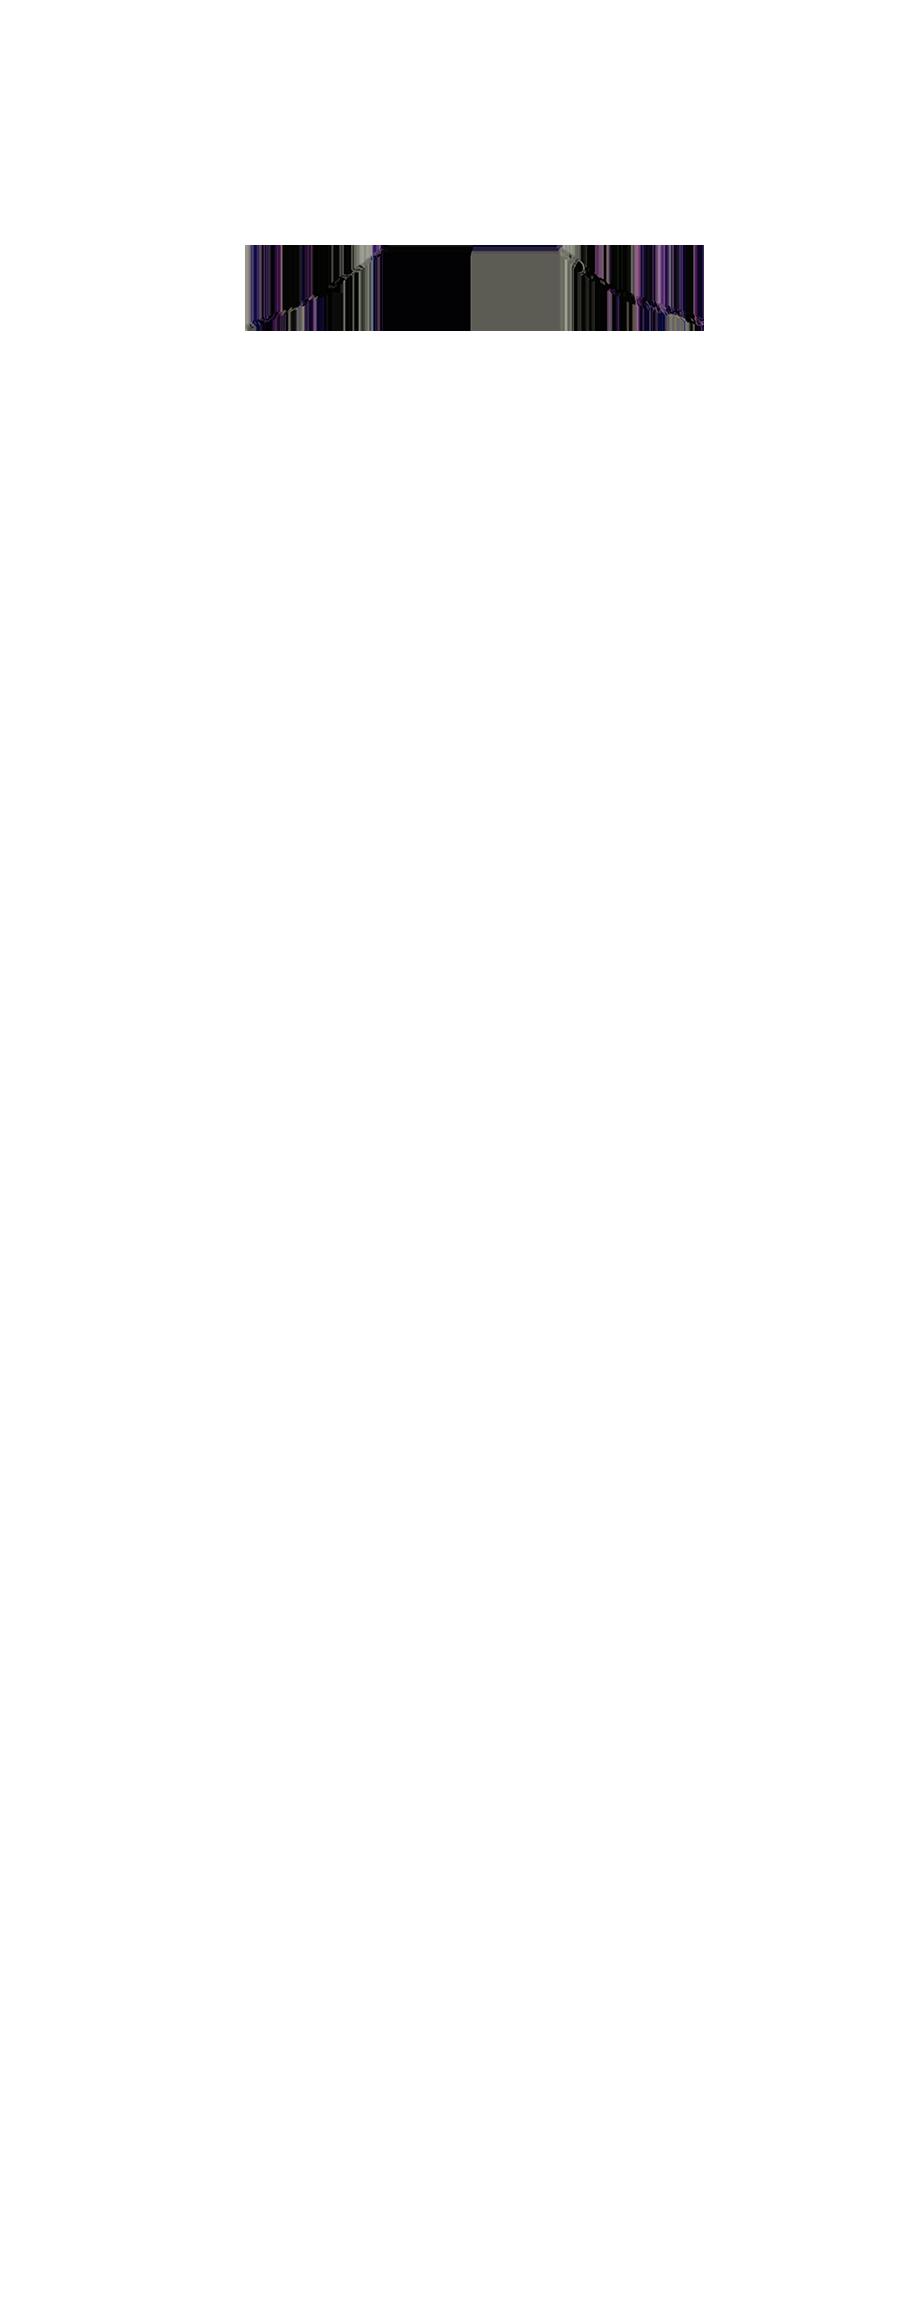 NEFL-1